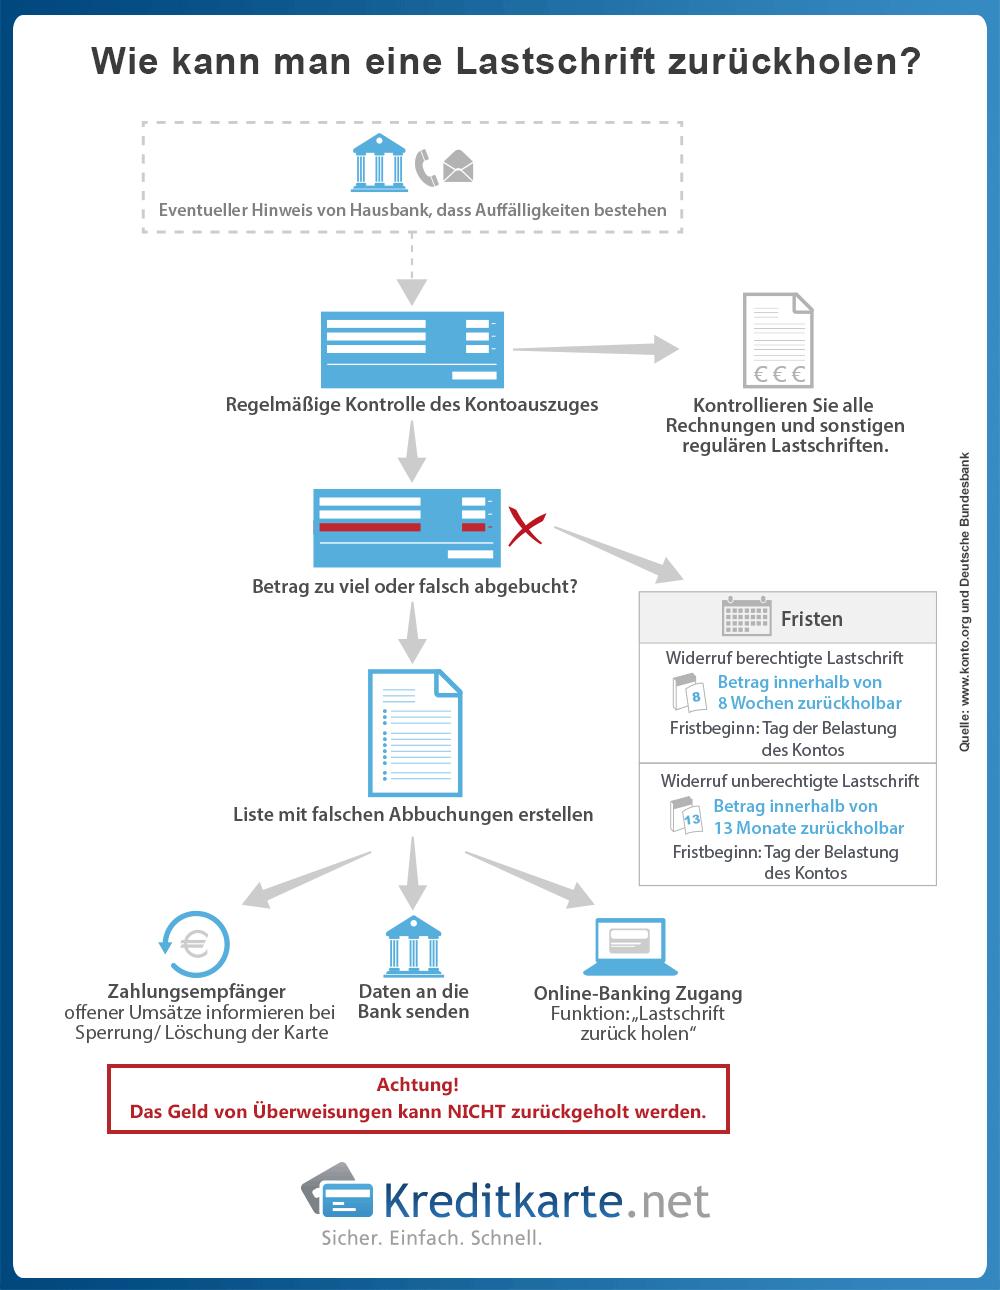 infografik-lastschrift-zurueckholen